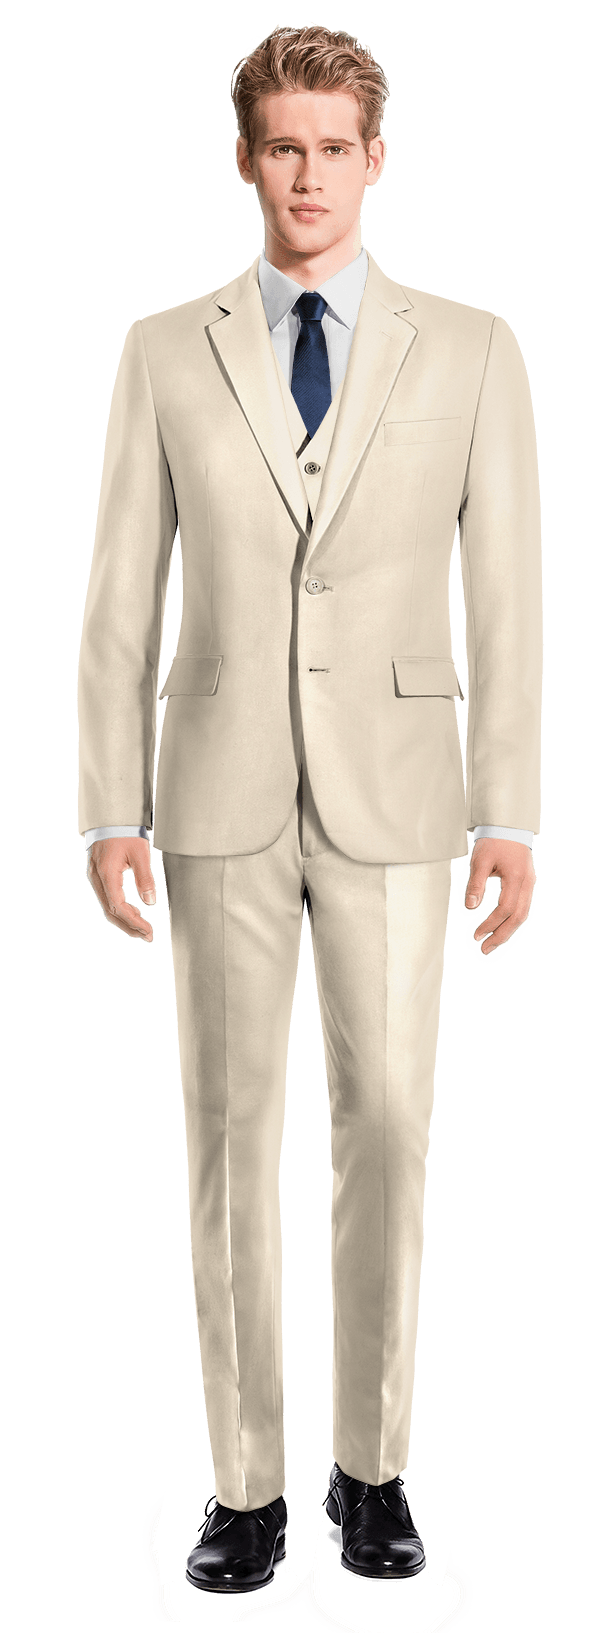 Costume beige 3 pièces en Polyester